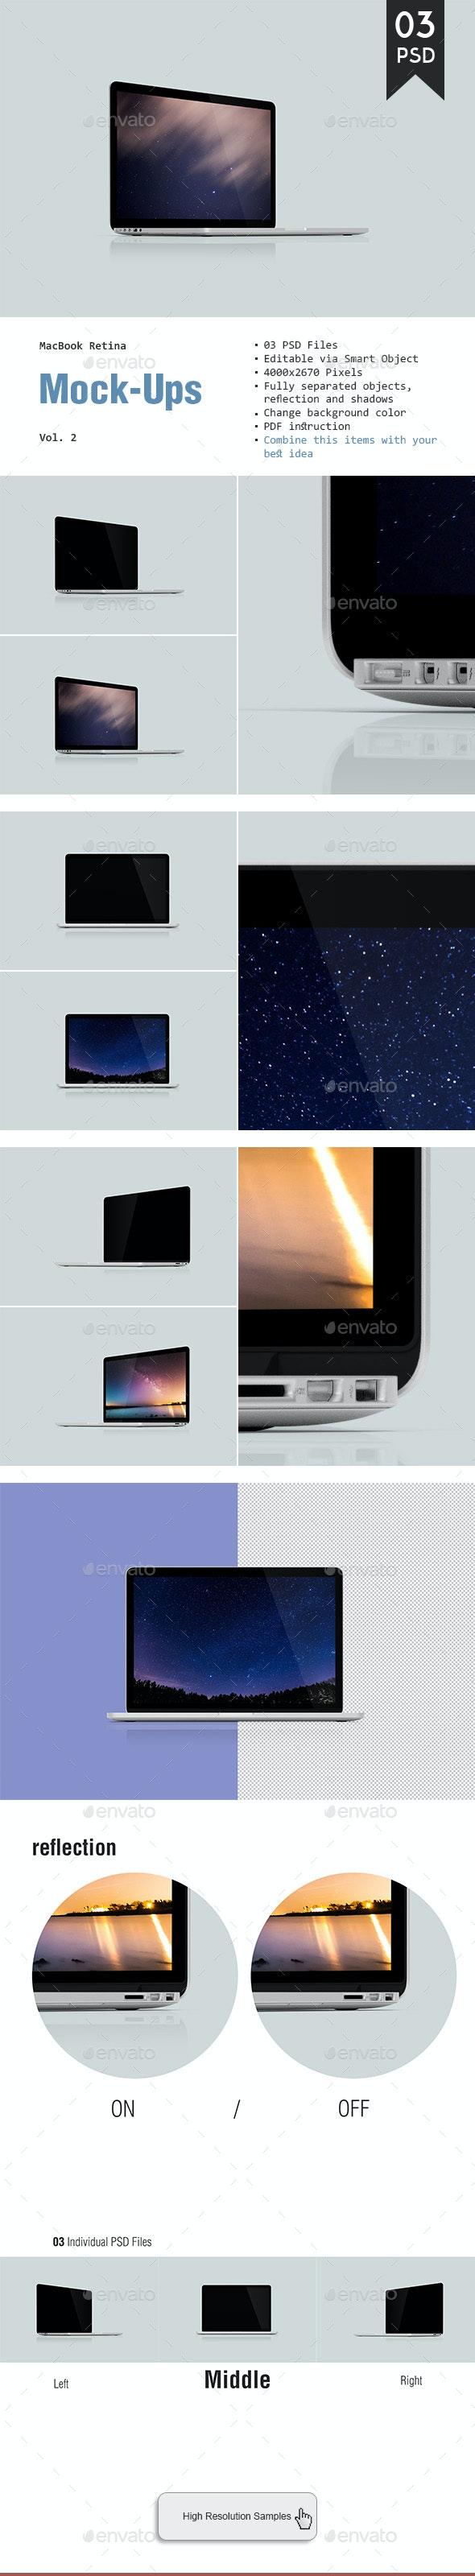 MacBook Retina Mockup - Laptop Displays